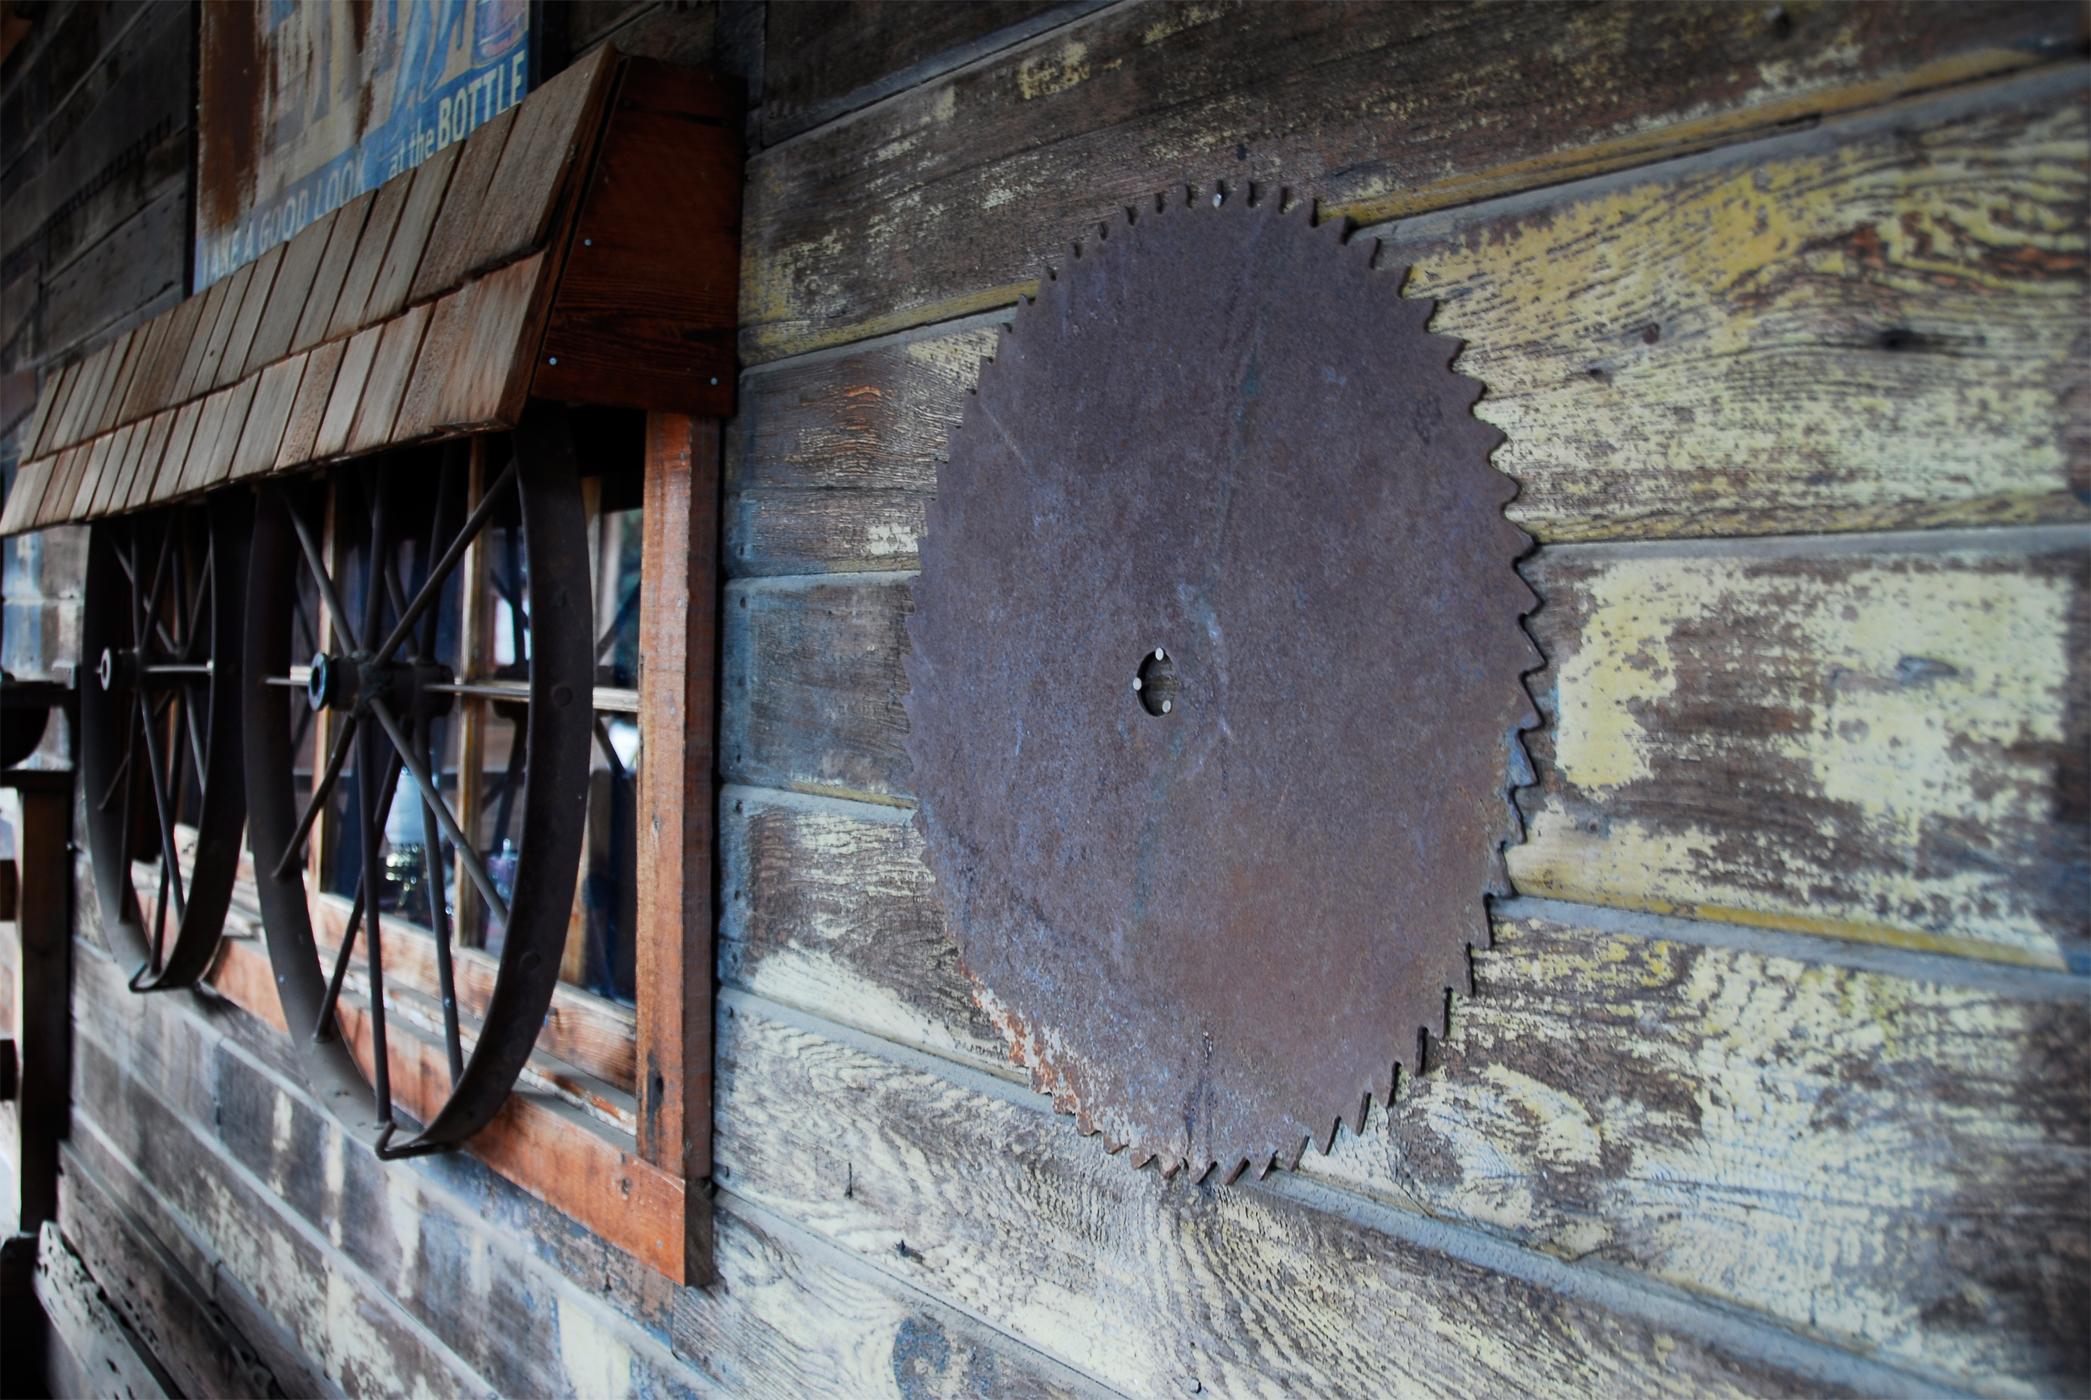 Saw blade & wagon wheel windows photo